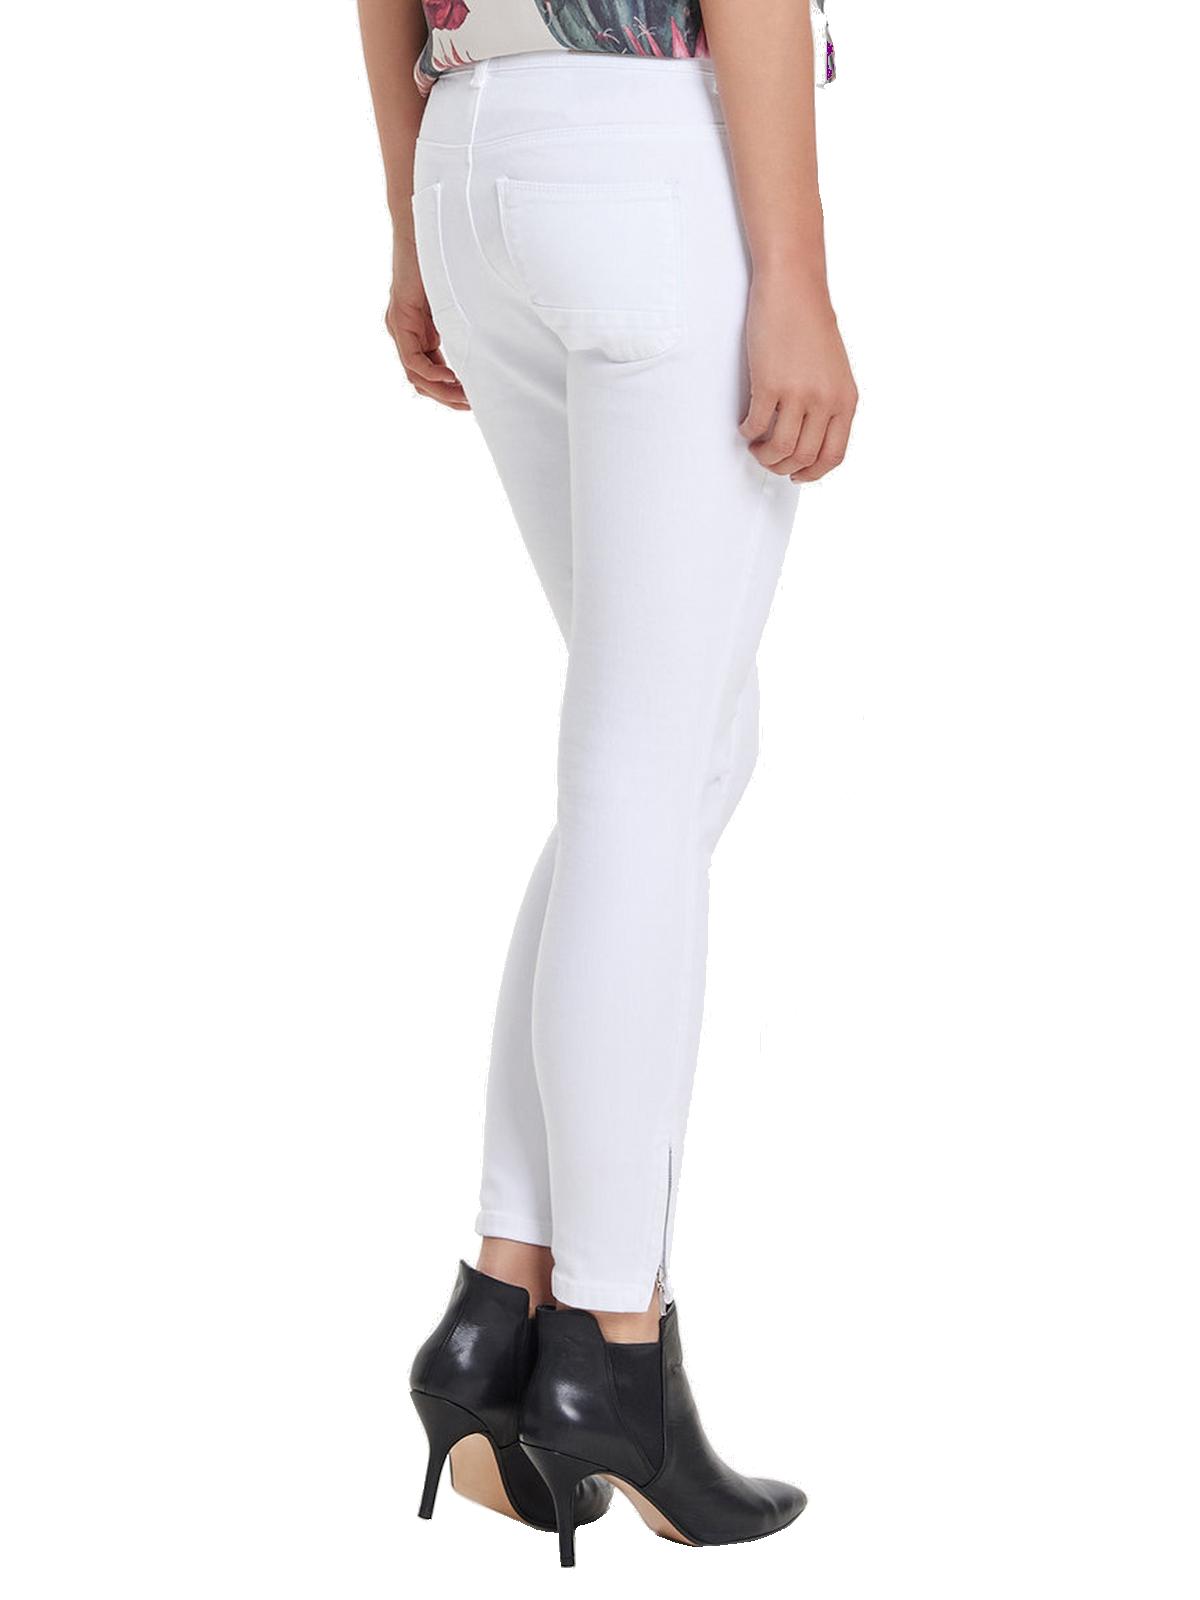 Only Damen Hose Regular Ankle Skinny-Jeans weiß modische weiße Hose ...